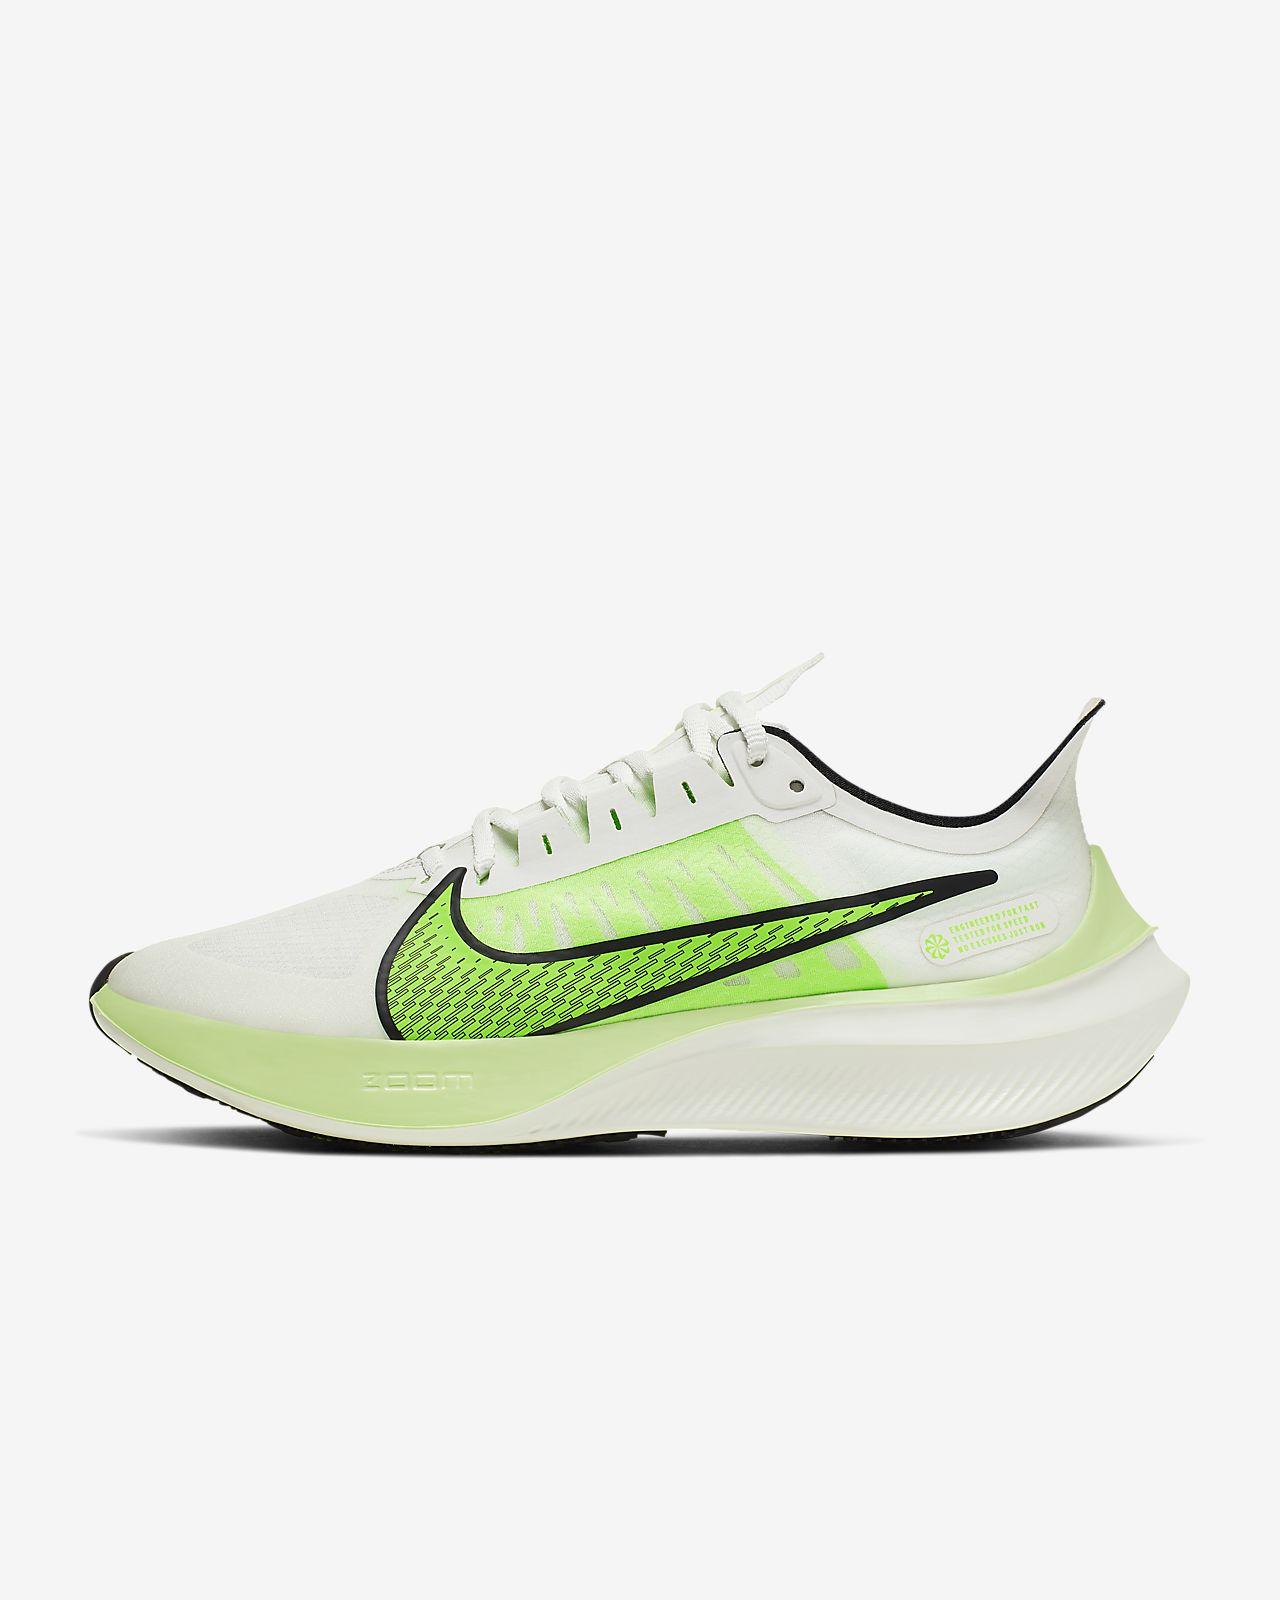 Nike Femme Chaussure Zoom Pour De Gravity Running hdxtsQCr